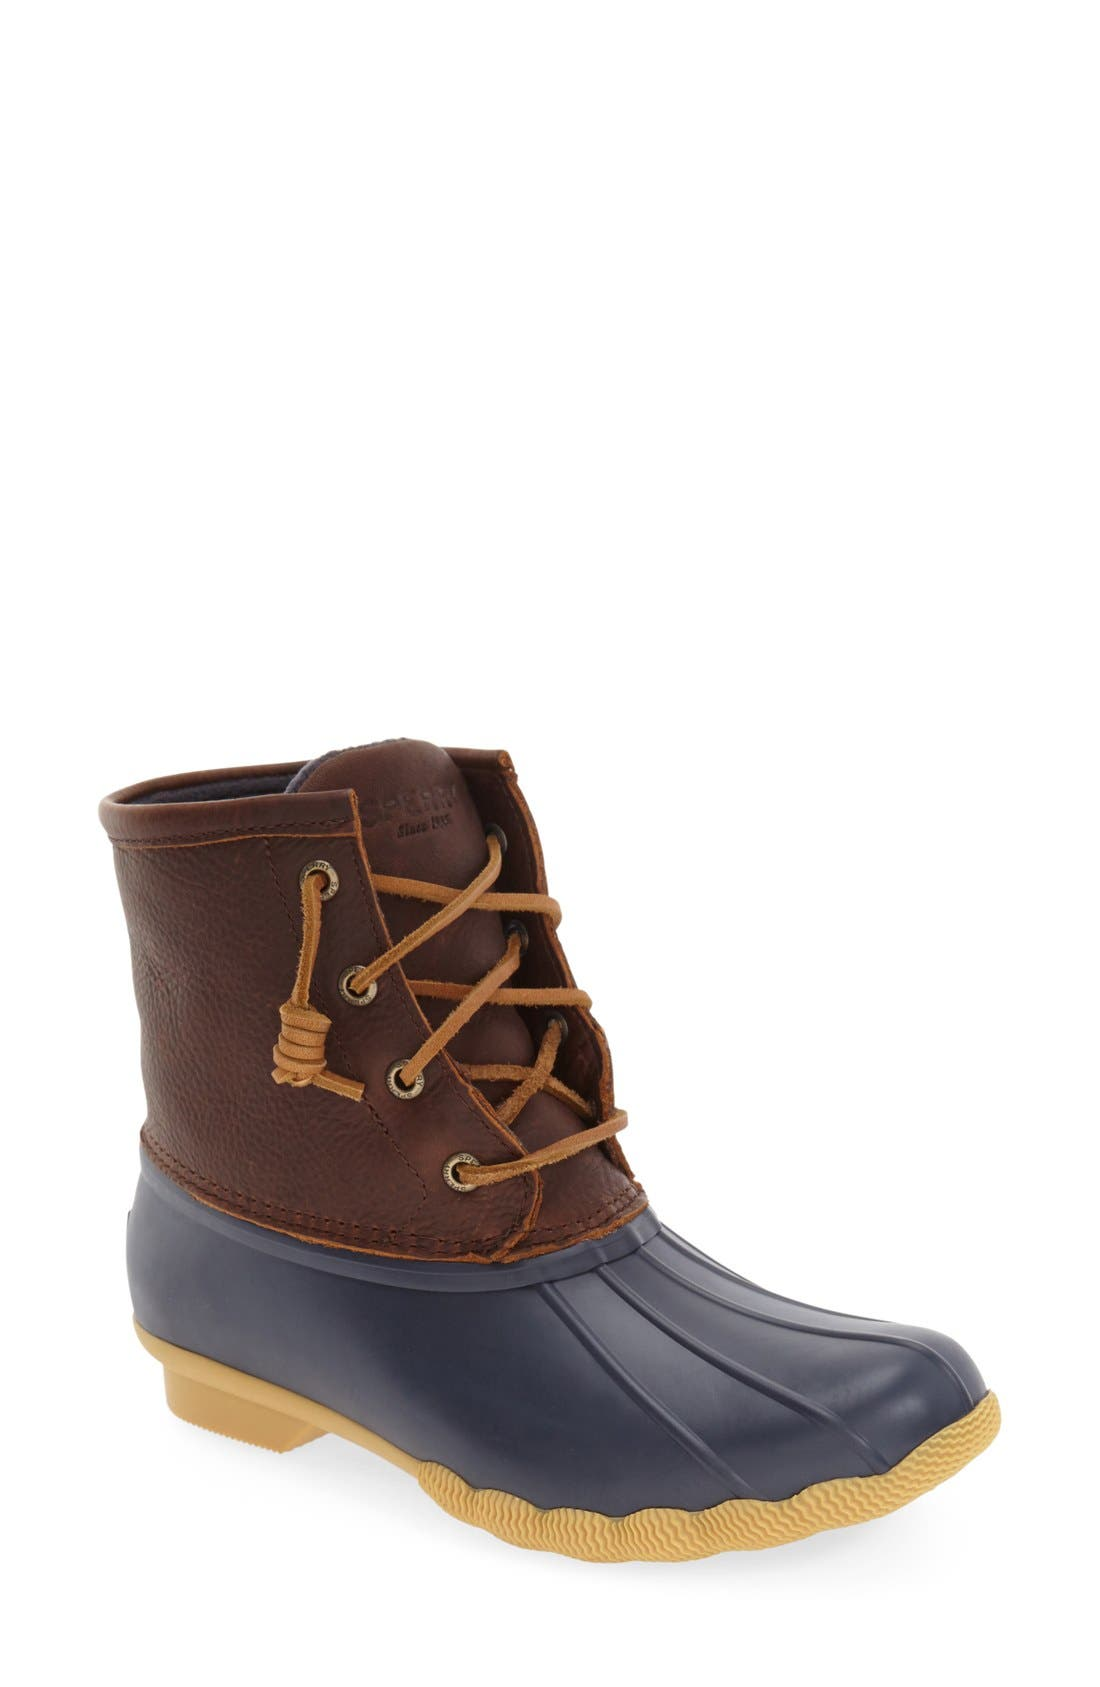 Alternate Image 1 Selected - Sperry Saltwater Thinsulate™ Waterproof Rain Boot (Women)